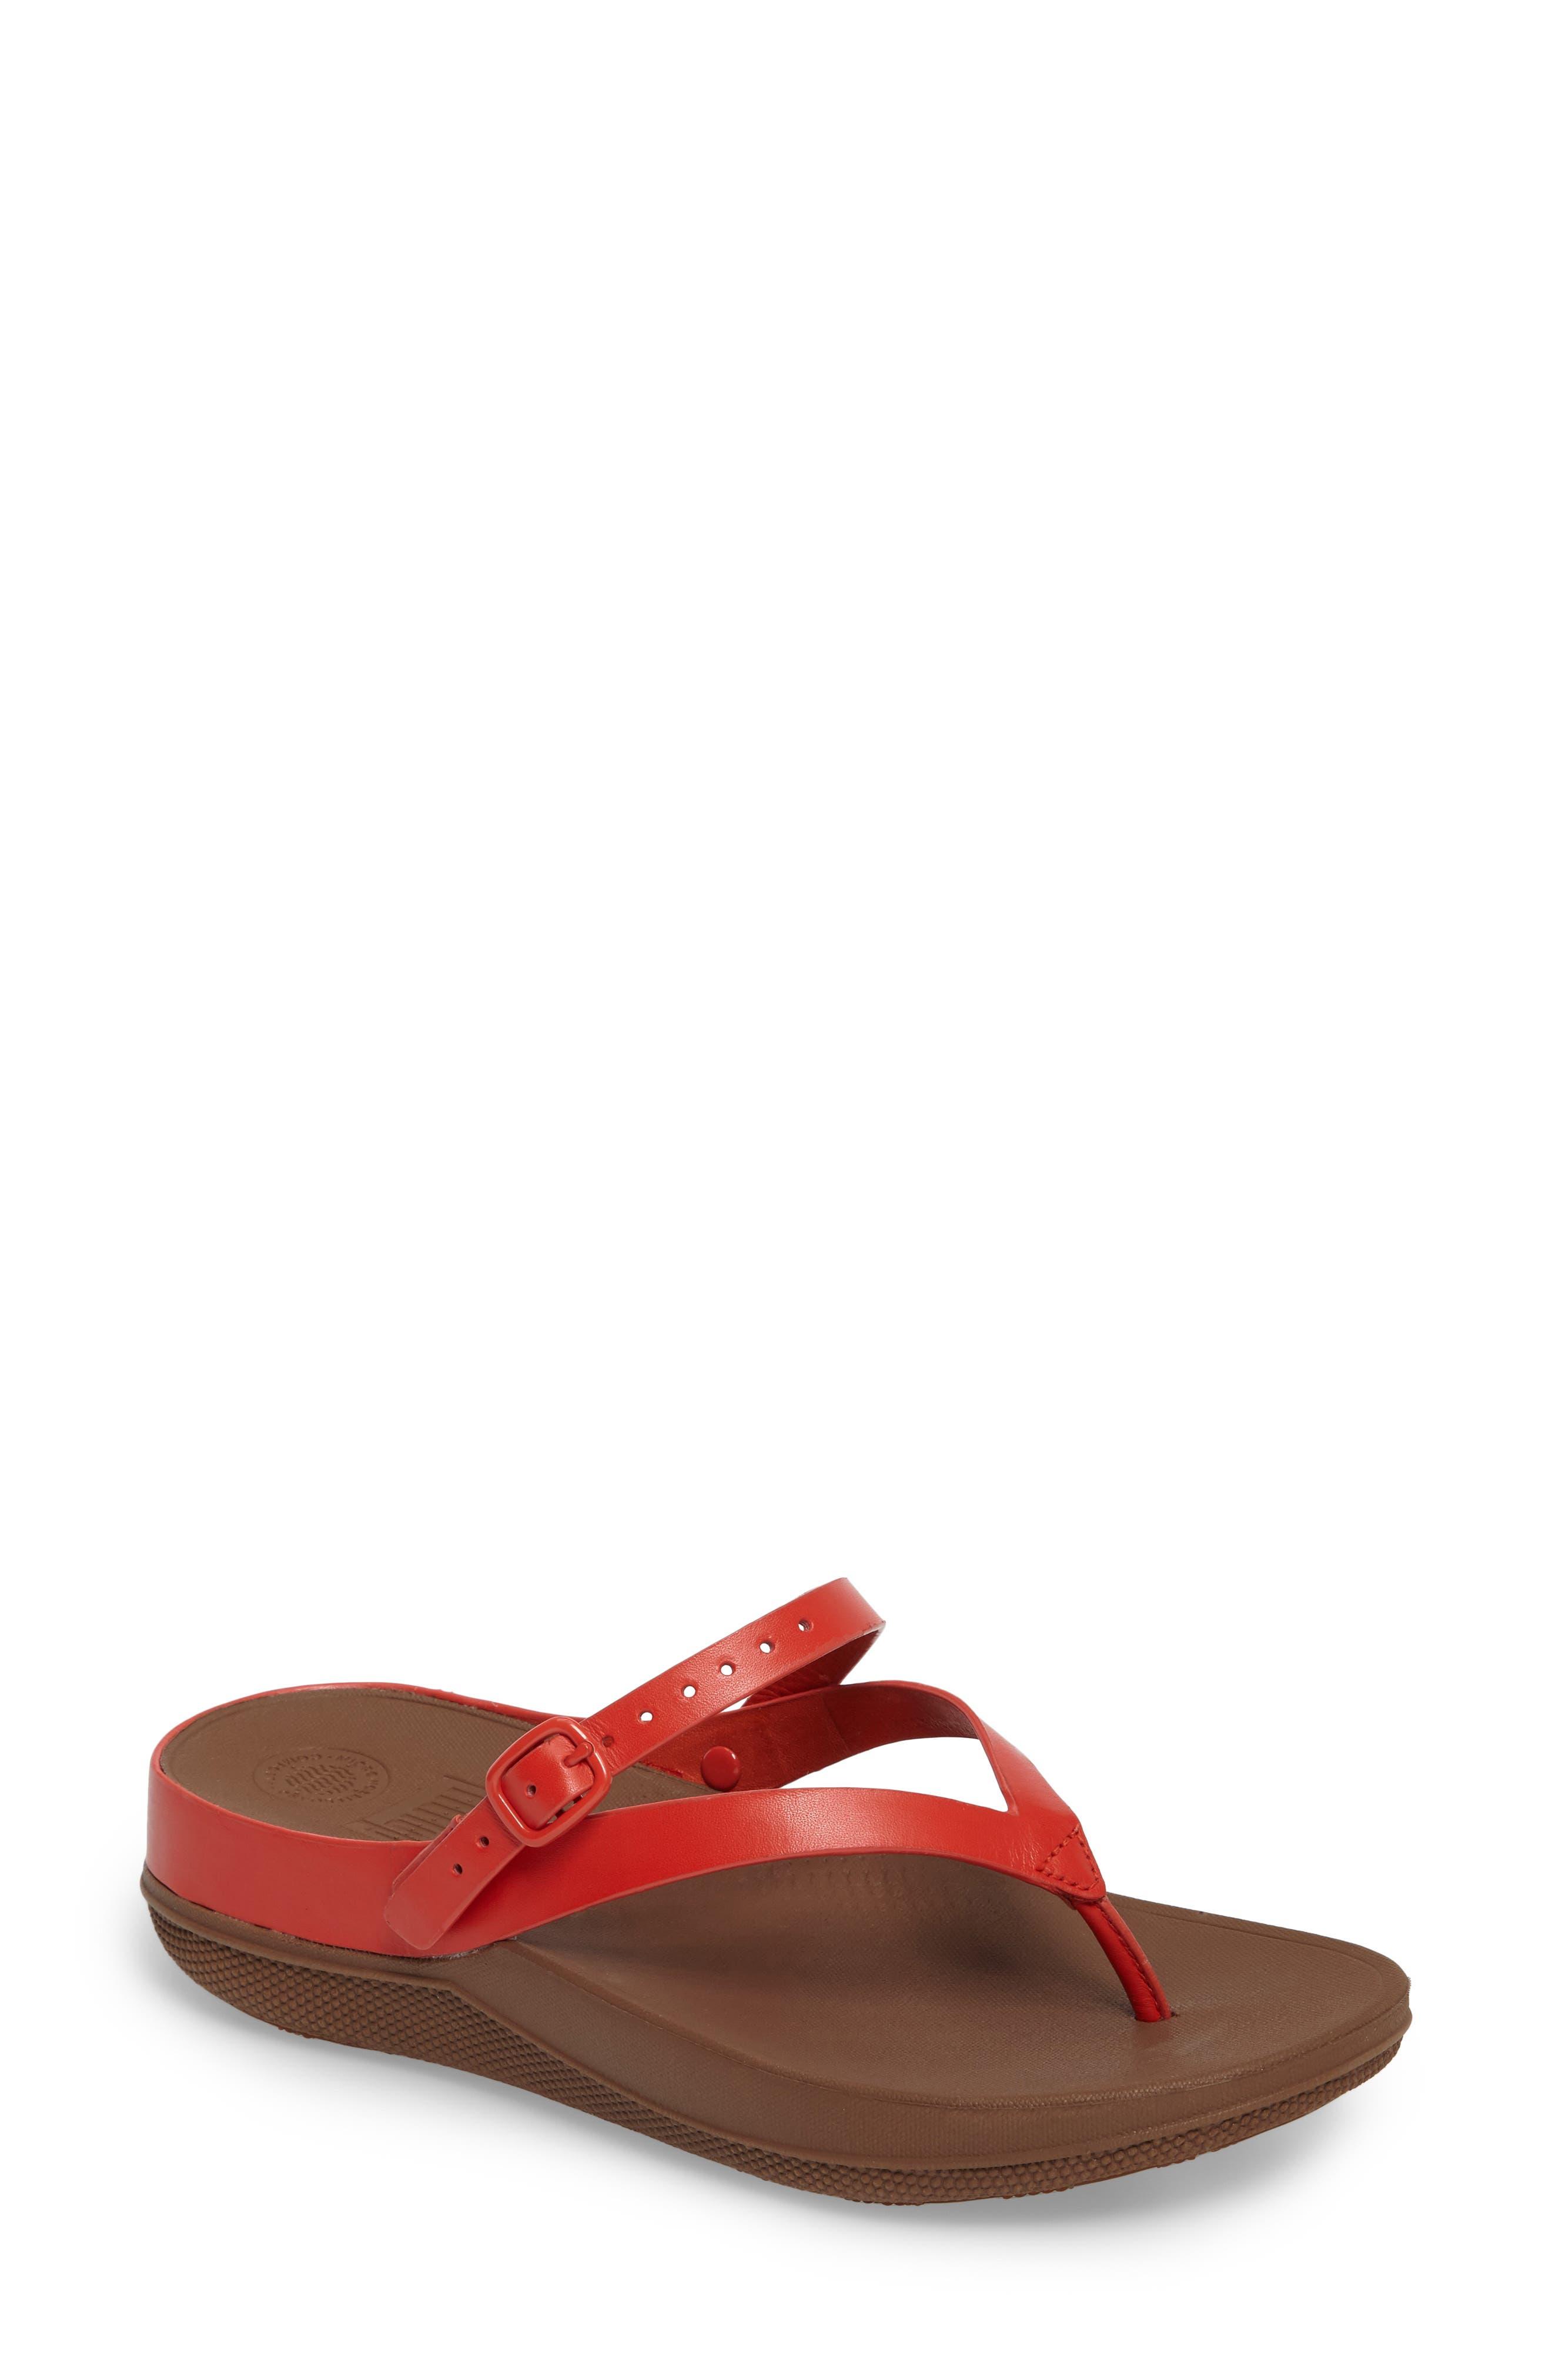 Alternate Image 1 Selected - FitFlop Flip Sandal (Women)